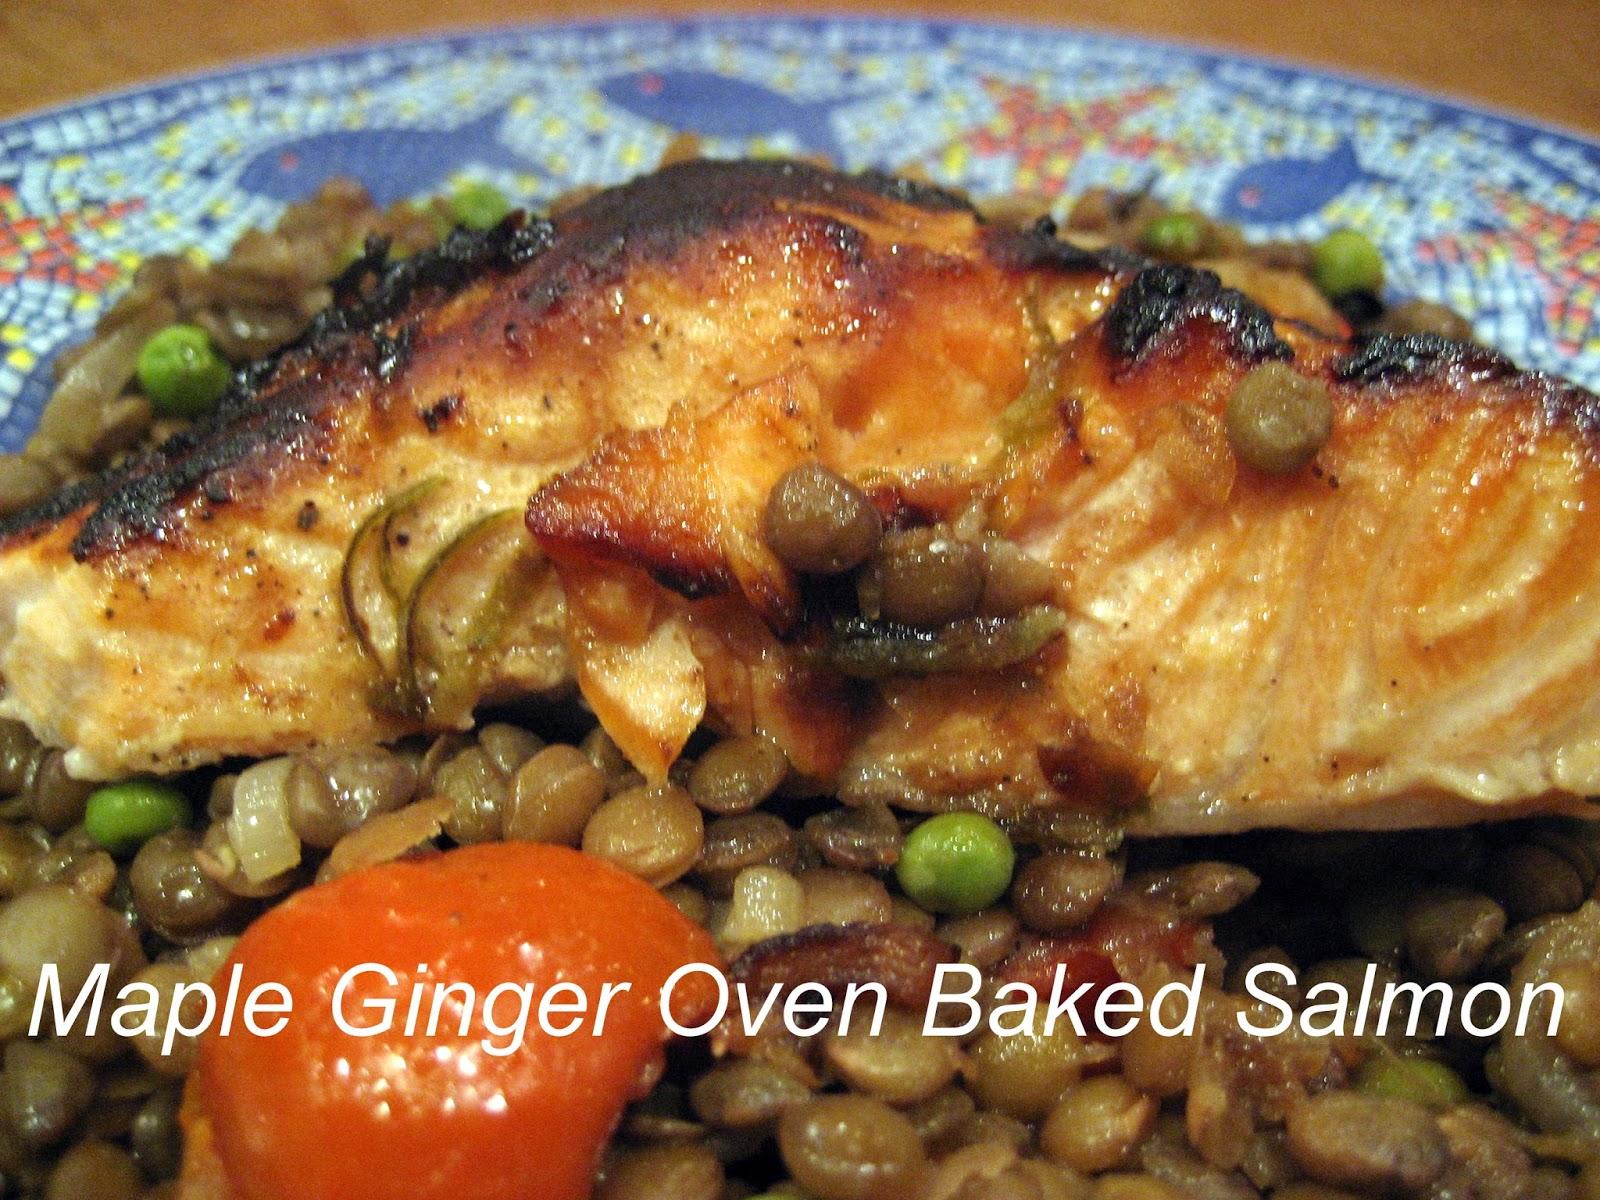 Diet easy dinner maple salmon fish recipe